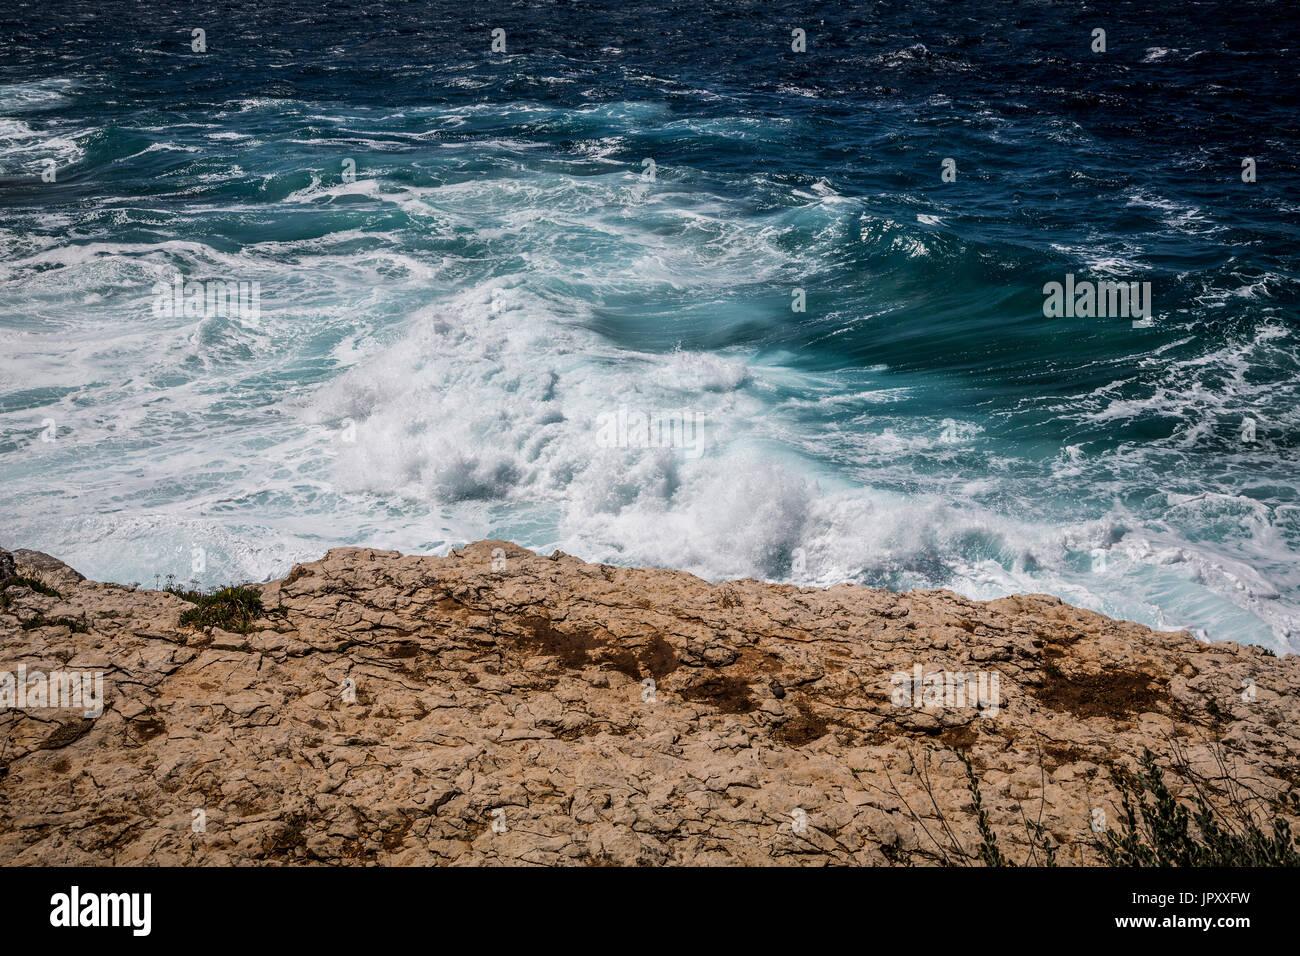 Powerful waves, Pula, Croatia - Stock Image